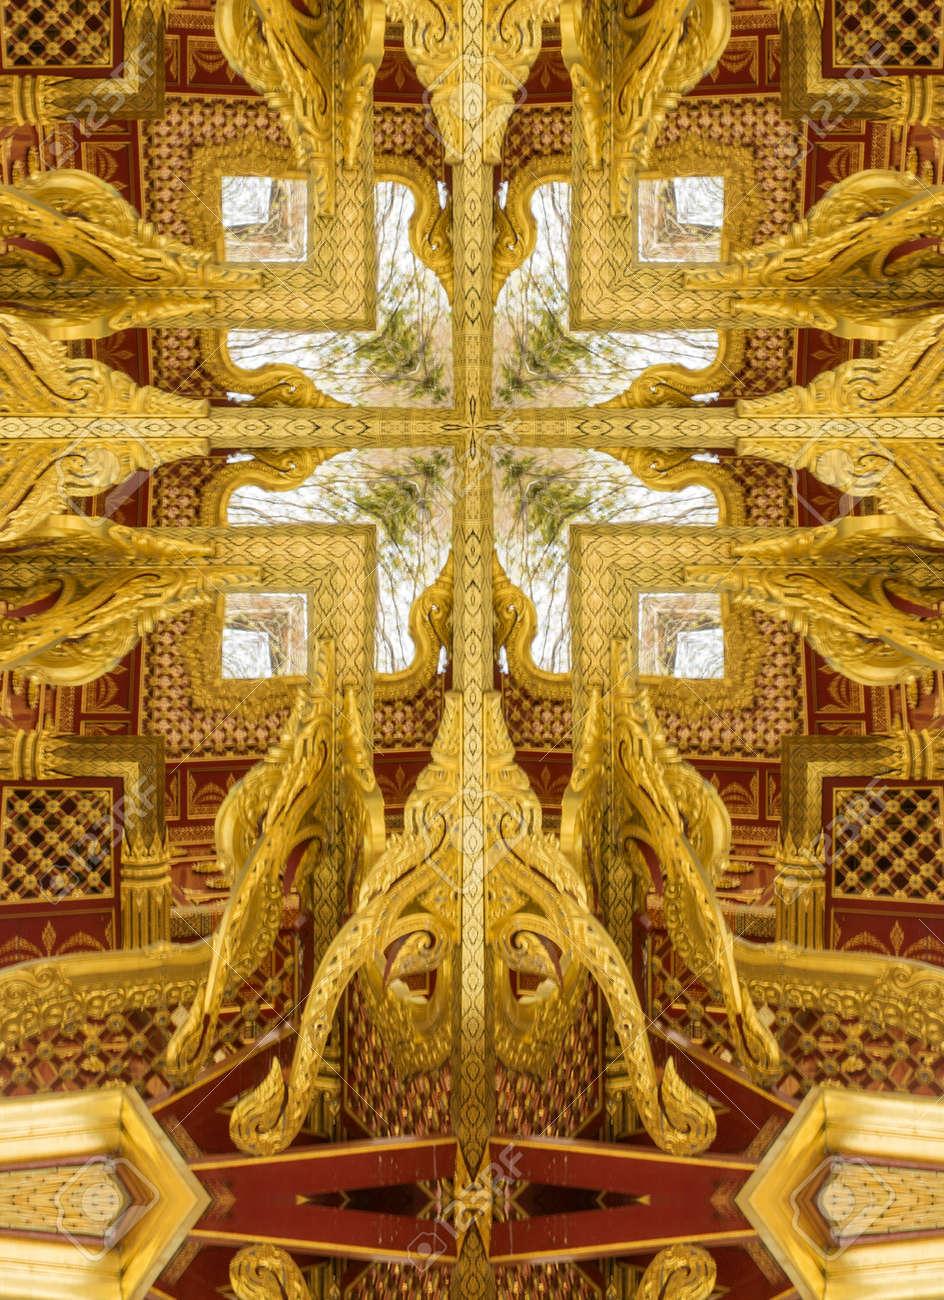 Garden Kaleidoscope At Olbrich >> Kaleidoscope Cross Gold Ceiling Detail Thai Pavilion Olbrich